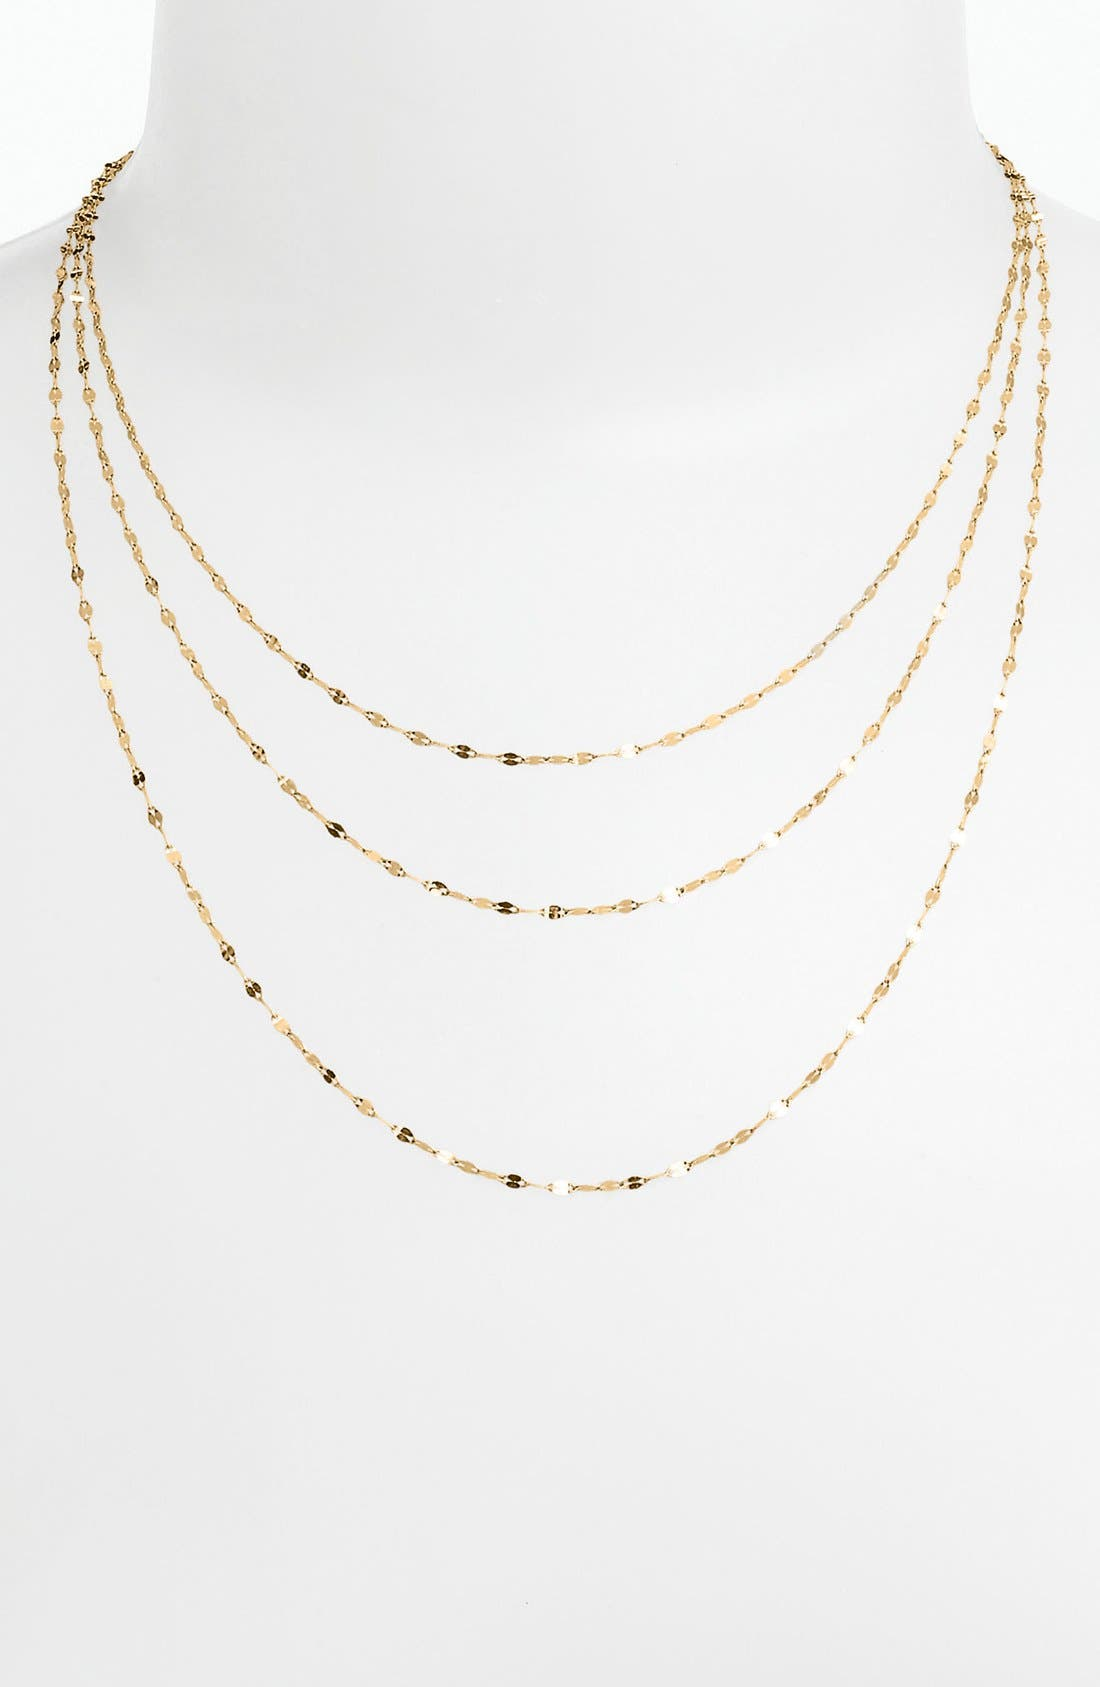 Main Image - Lana Jewelry 'Small Sienna' Necklace